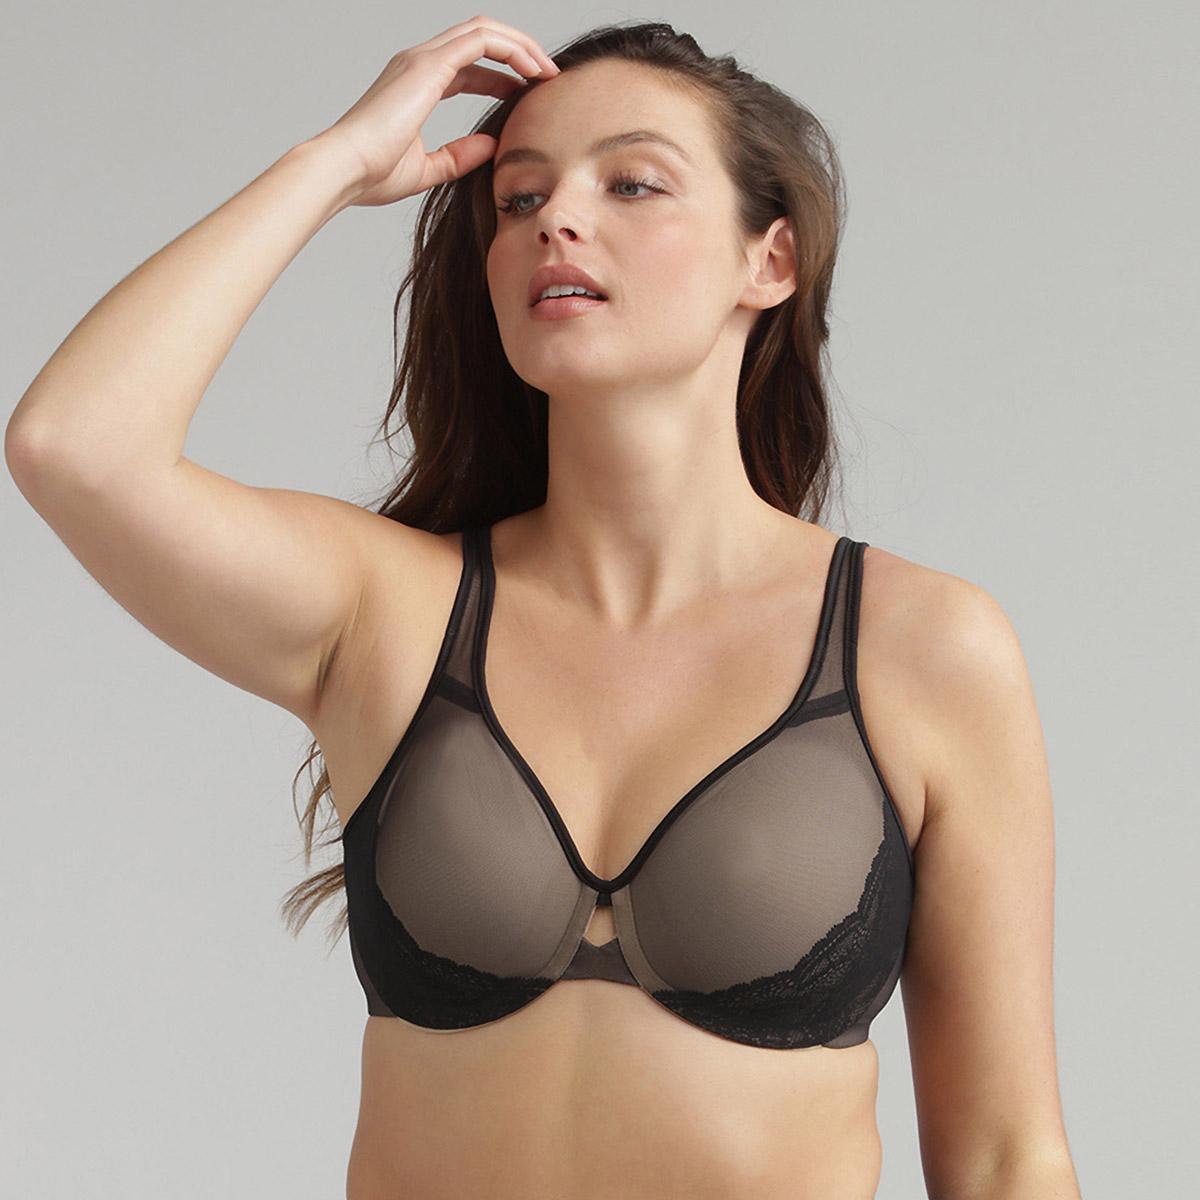 Minimiser bra in black Expert In Silhouette, , PLAYTEX